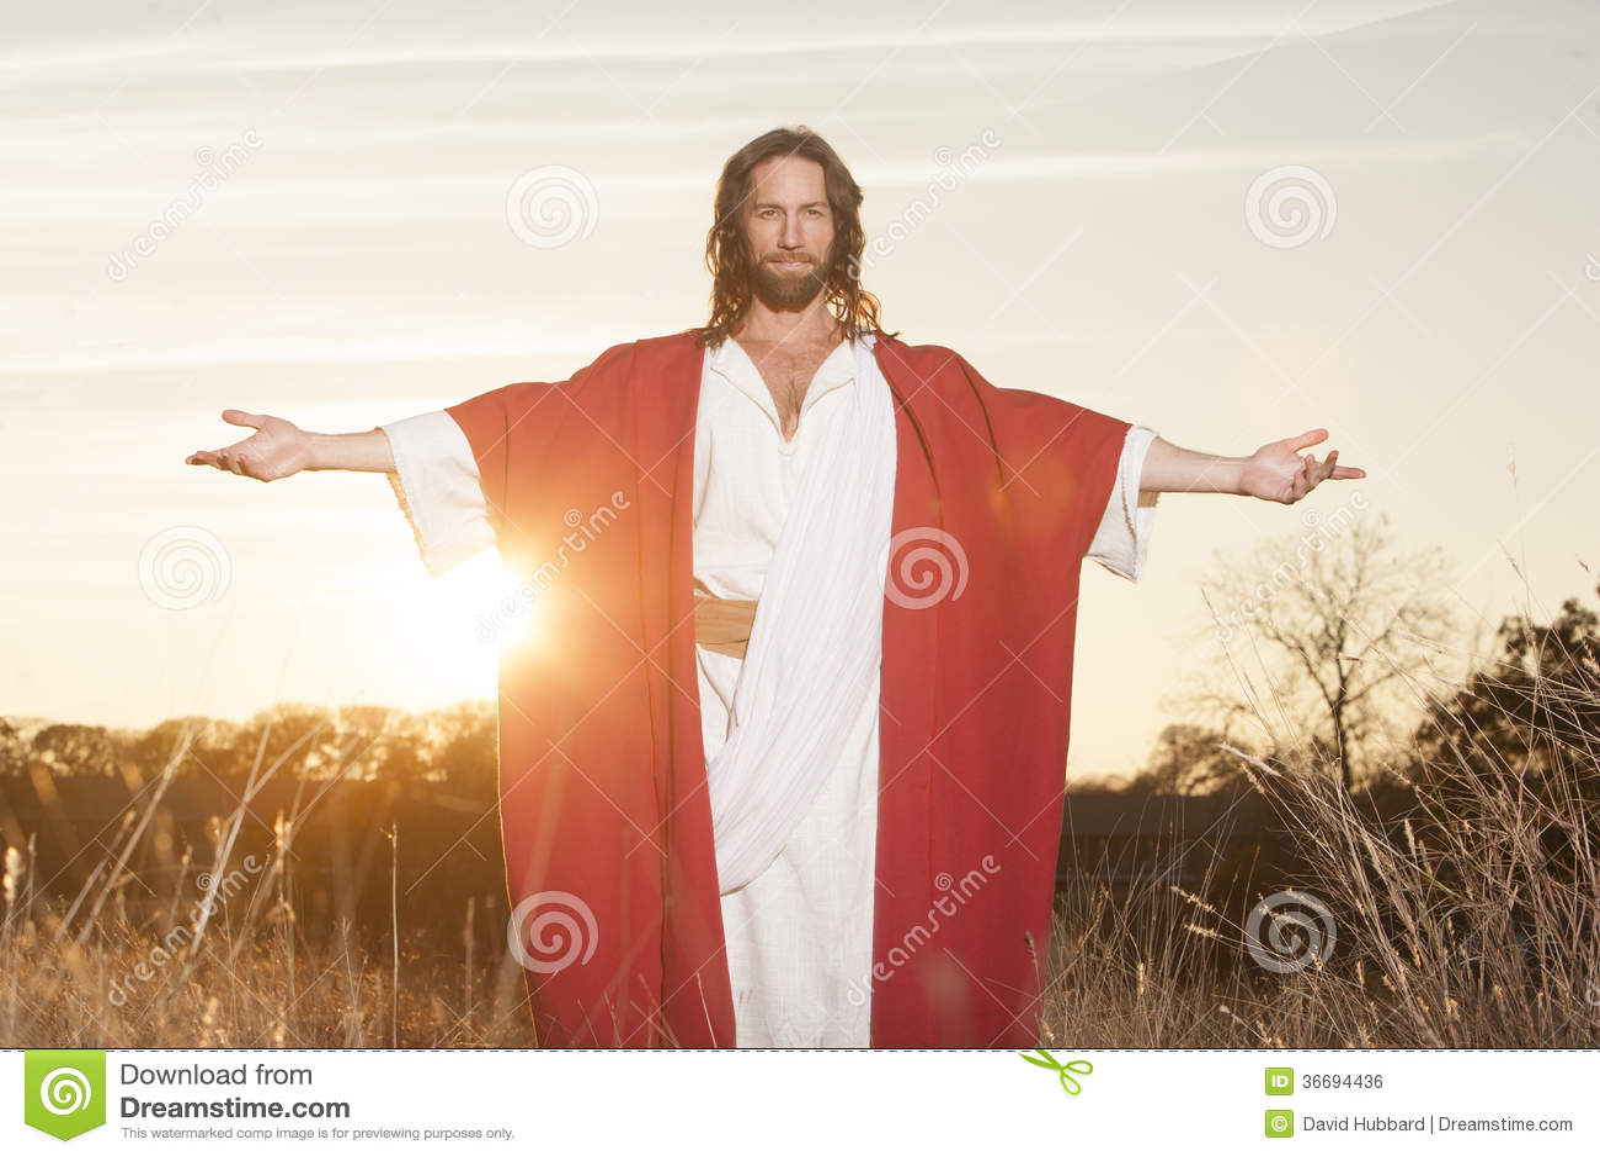 easter risen embrase royalty free stock image image 36694436